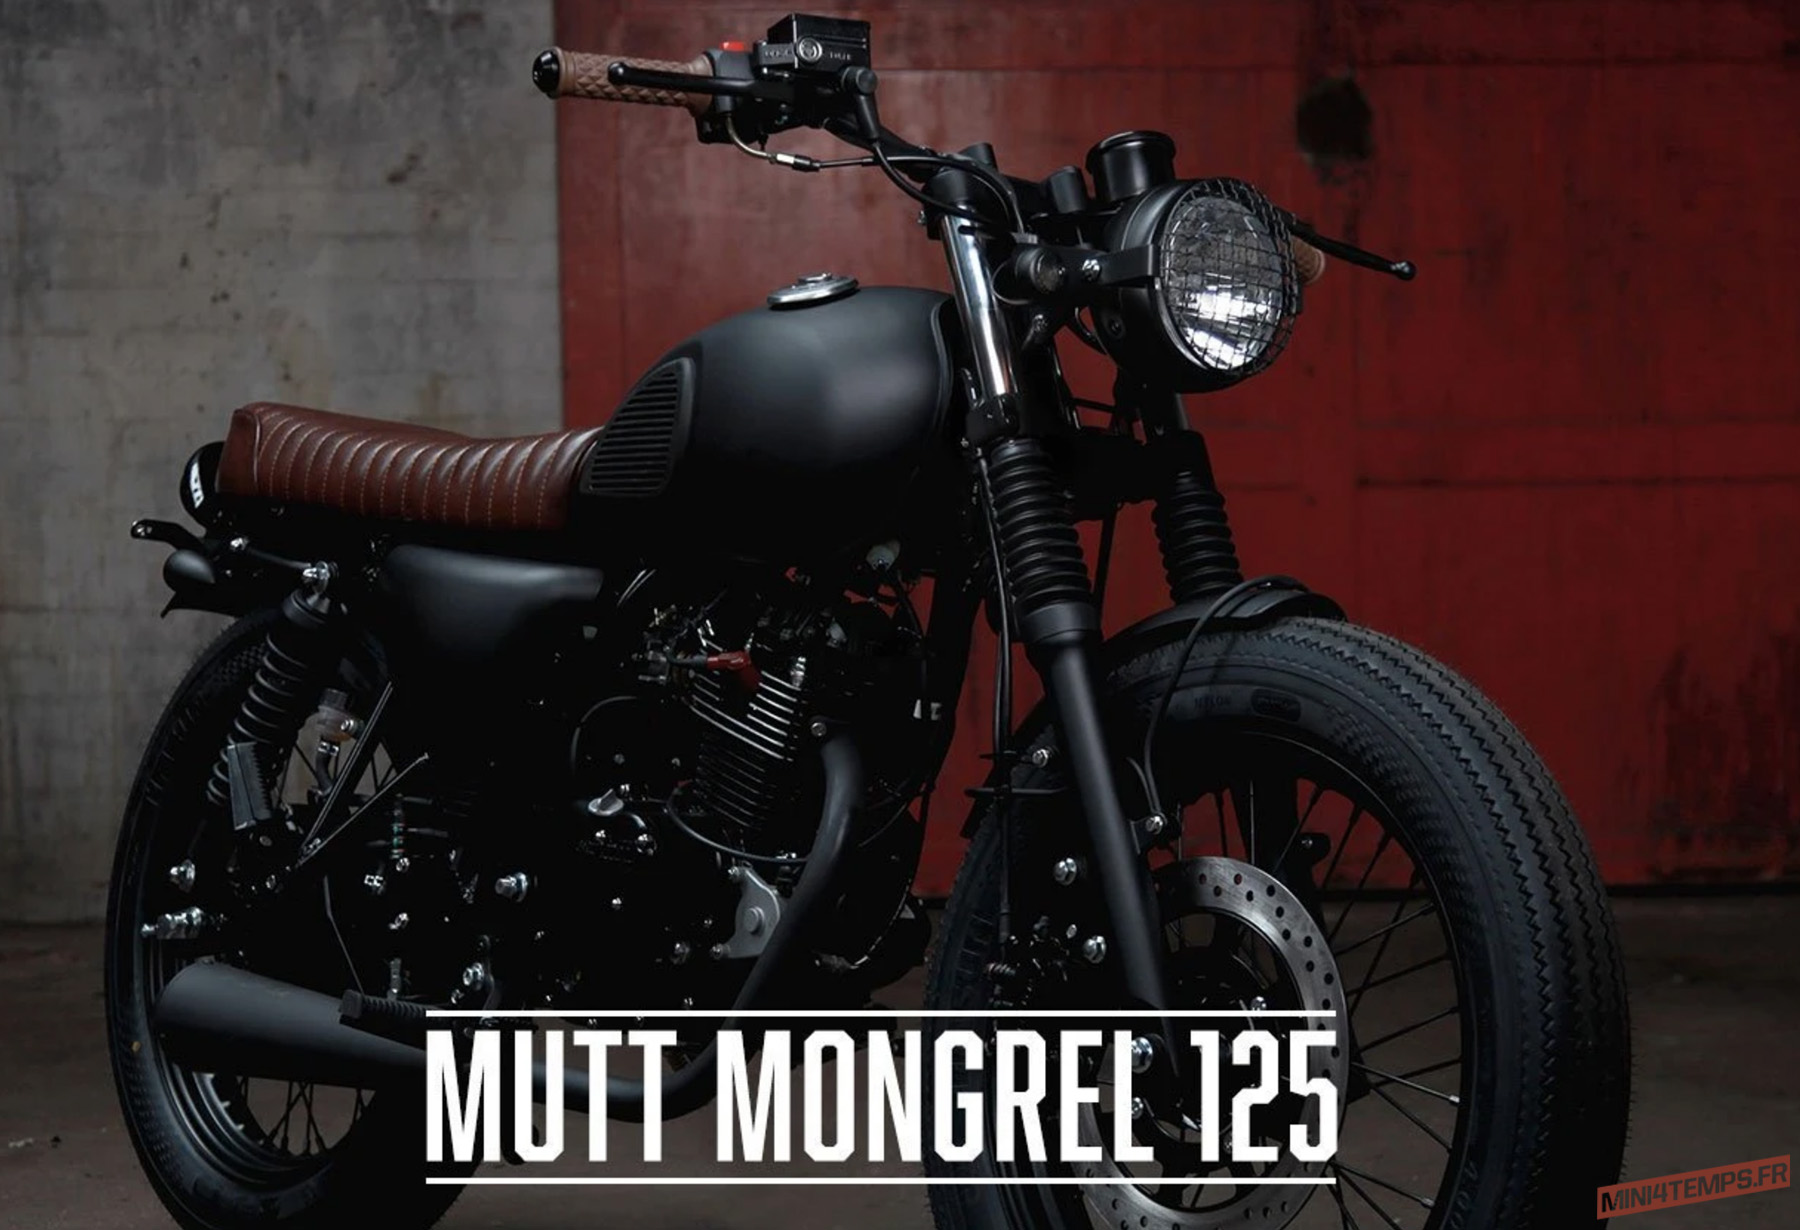 Mutt Motorcycles 125 cc Moto Néo-Rétro Café Racer - mini4temps.fr